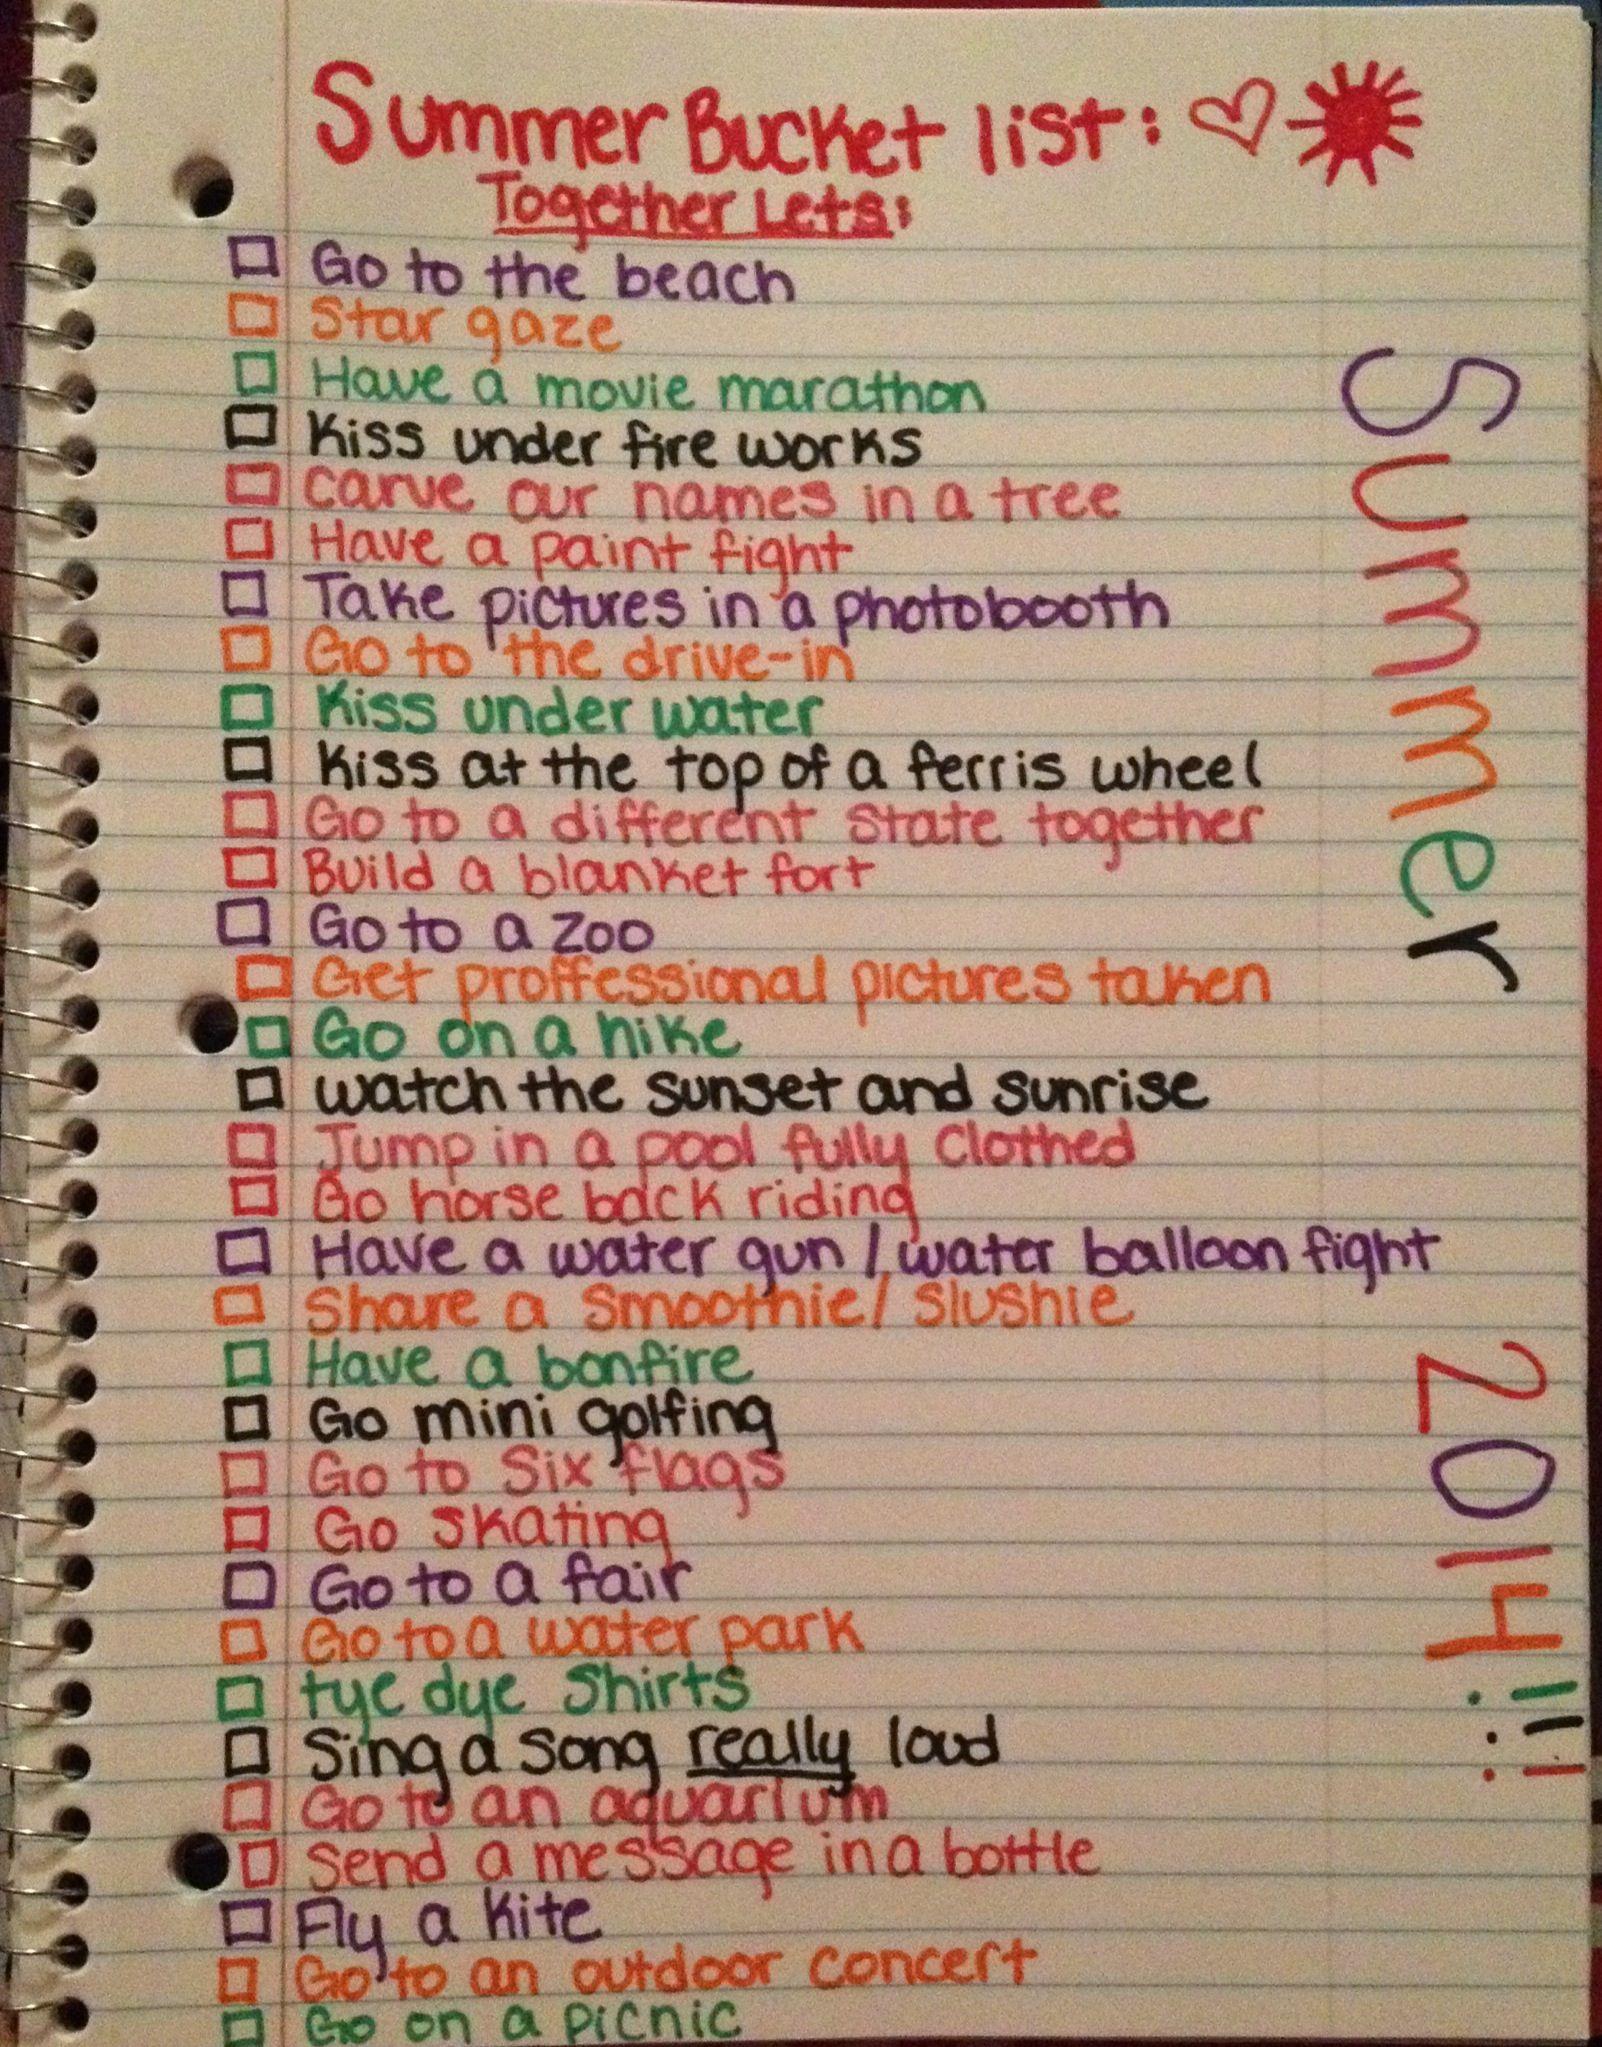 Tumblr List Bucket Summer